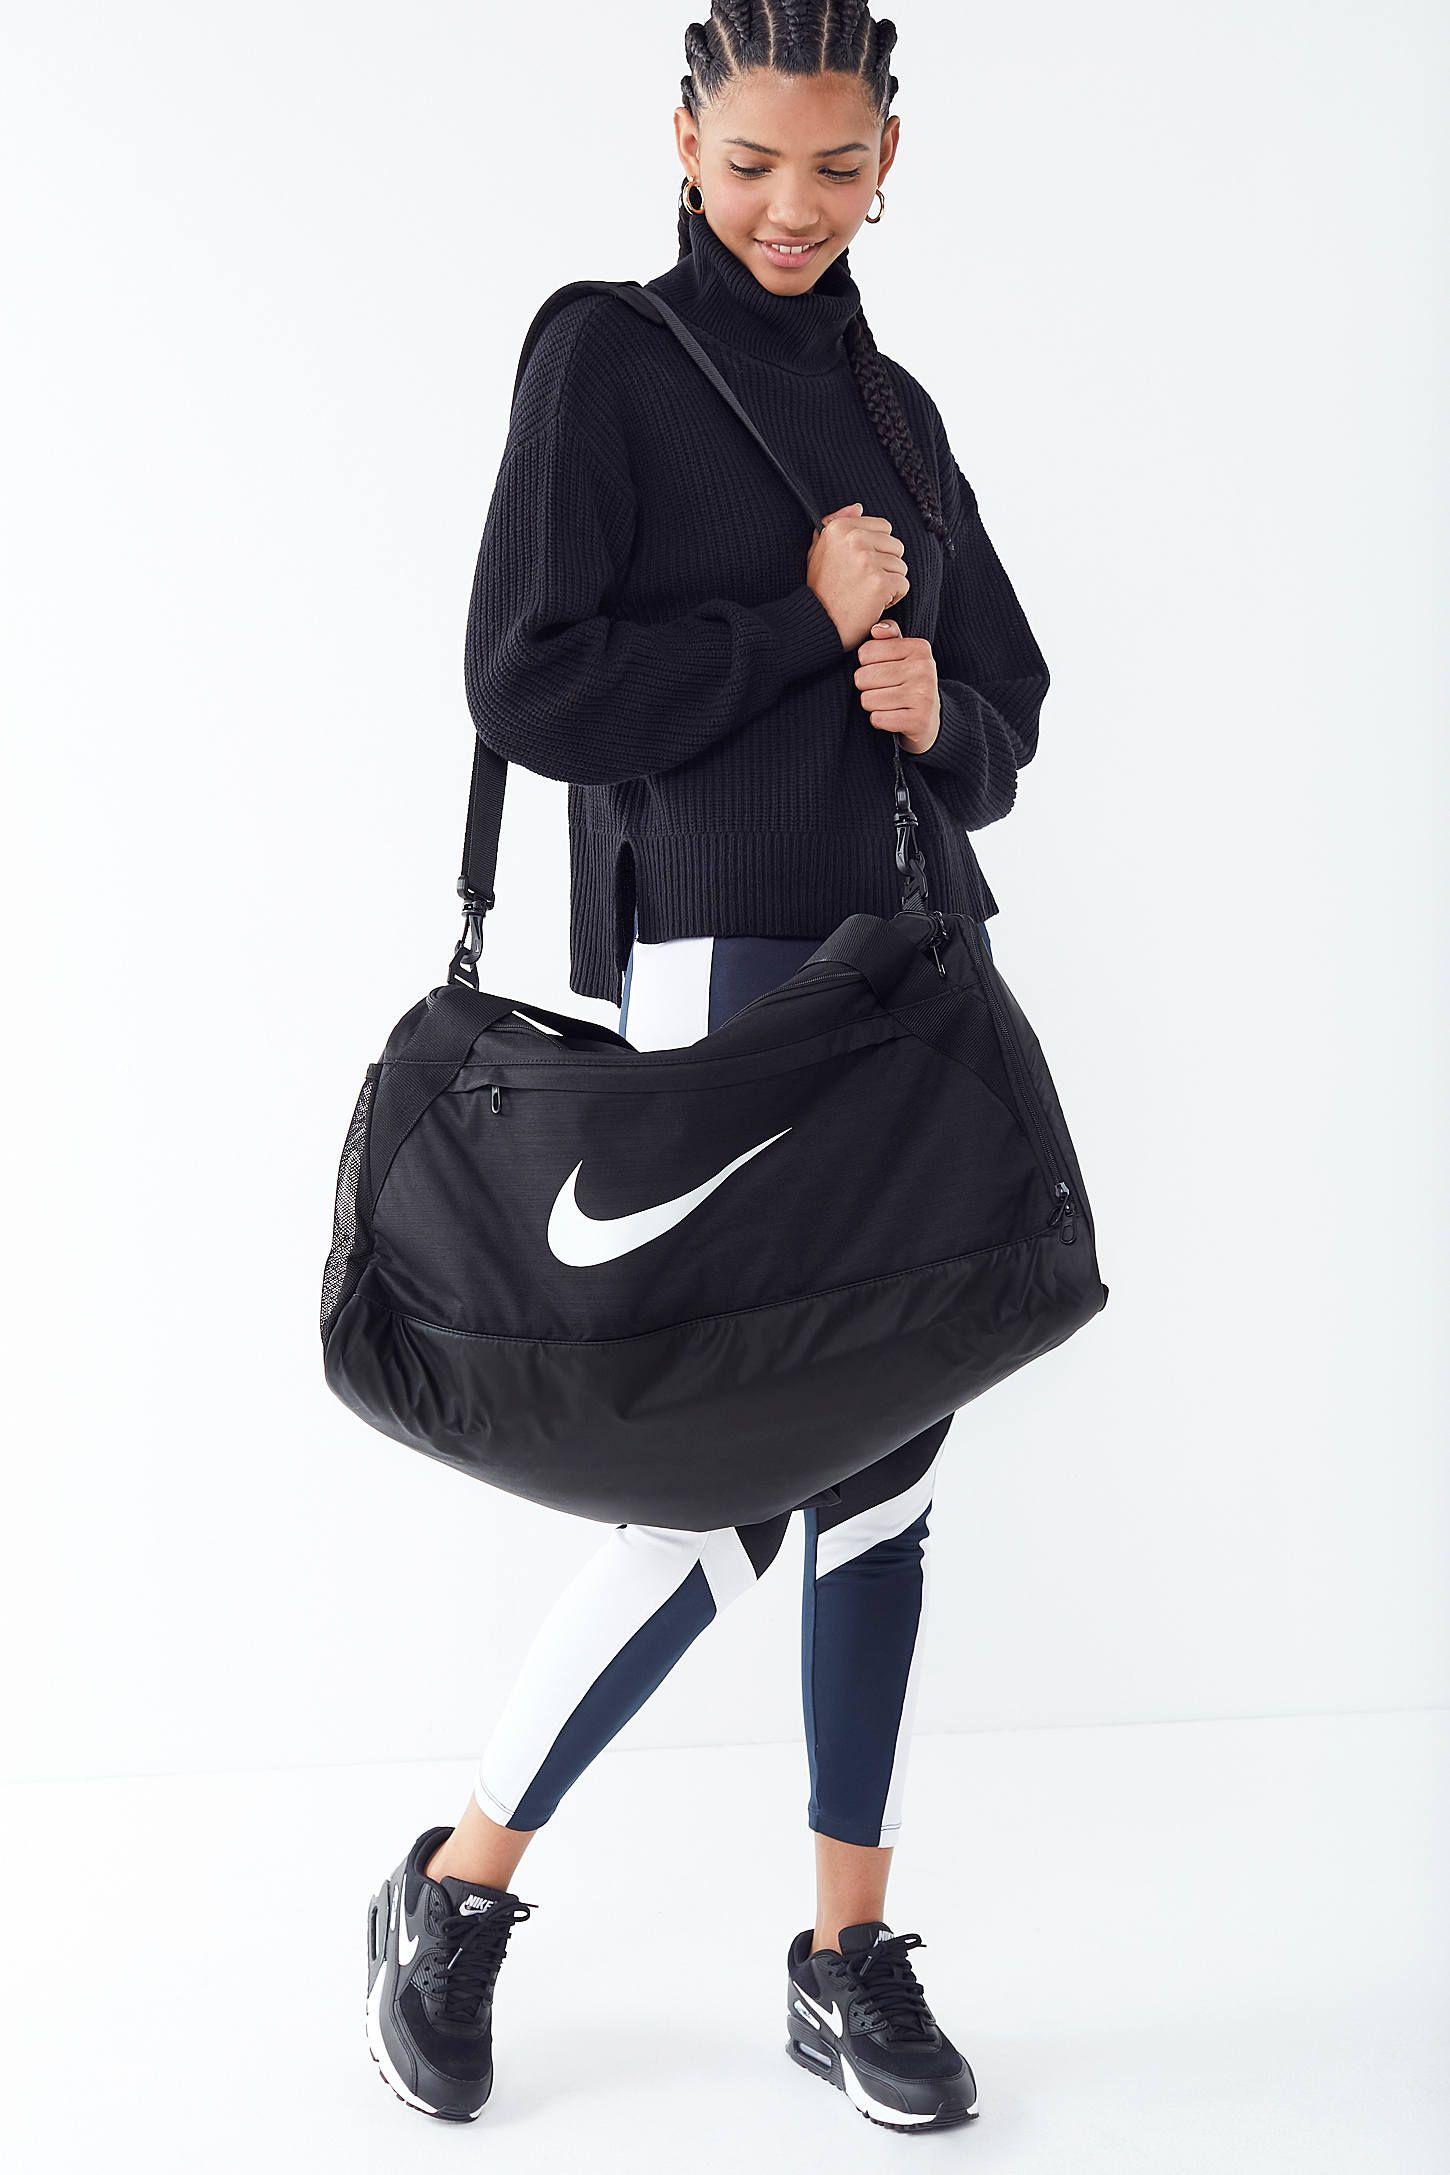 Nike Brasilia Medium Duffel Bag a7776fcfd78ce